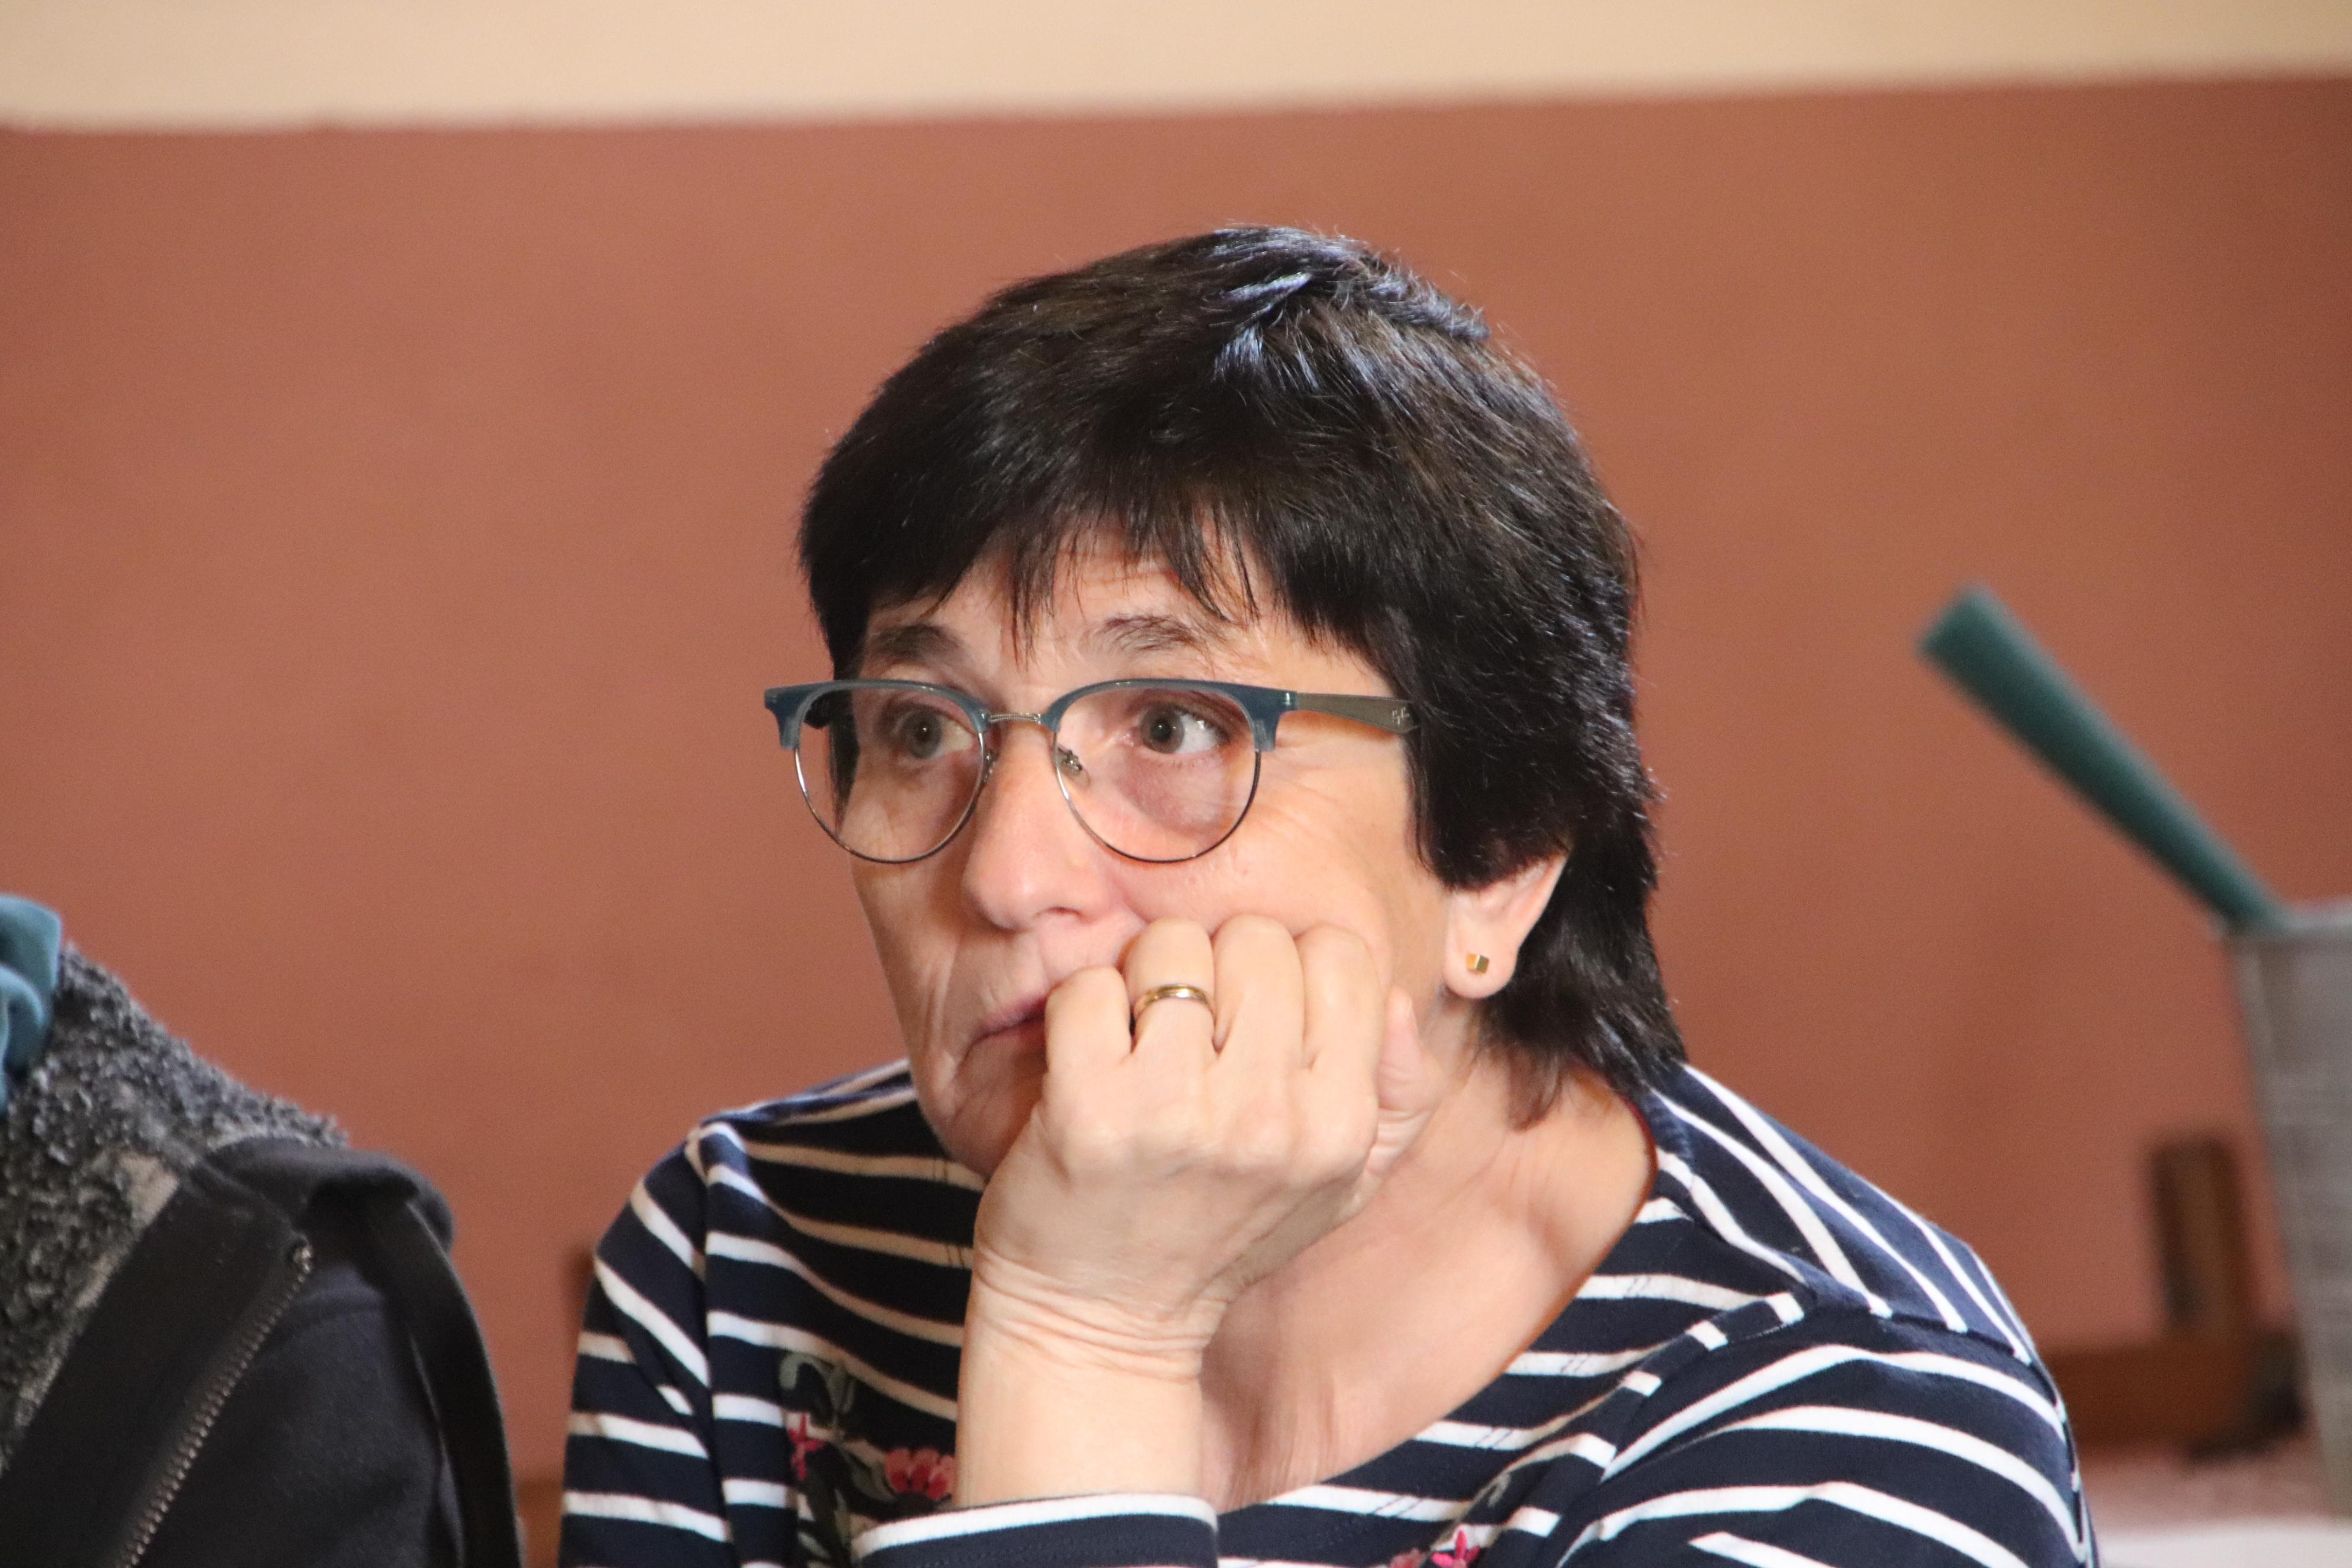 Francesca Figueras